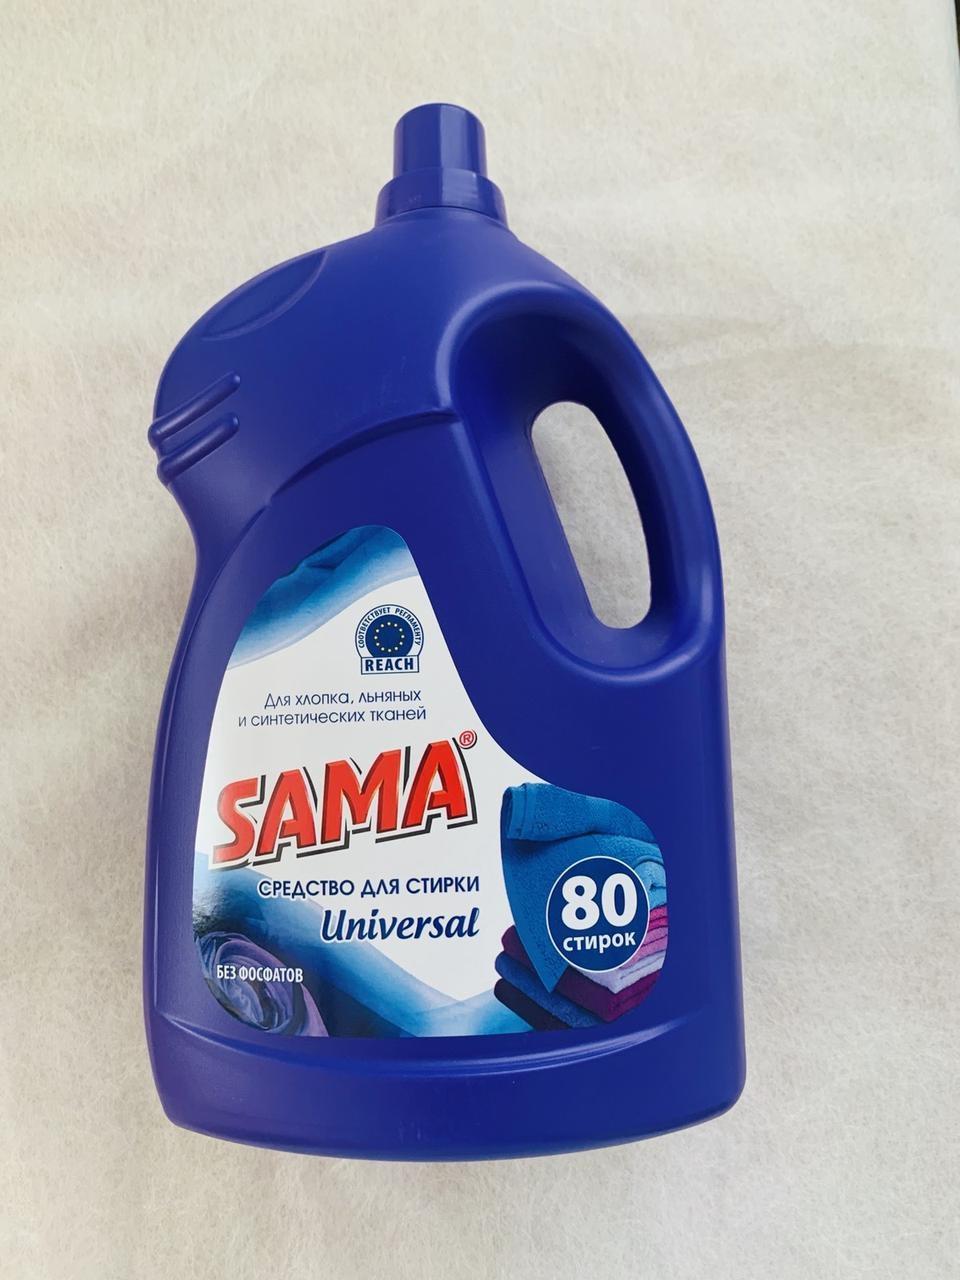 Средство для стирки SAMA Universal 4 литра 80 стирок